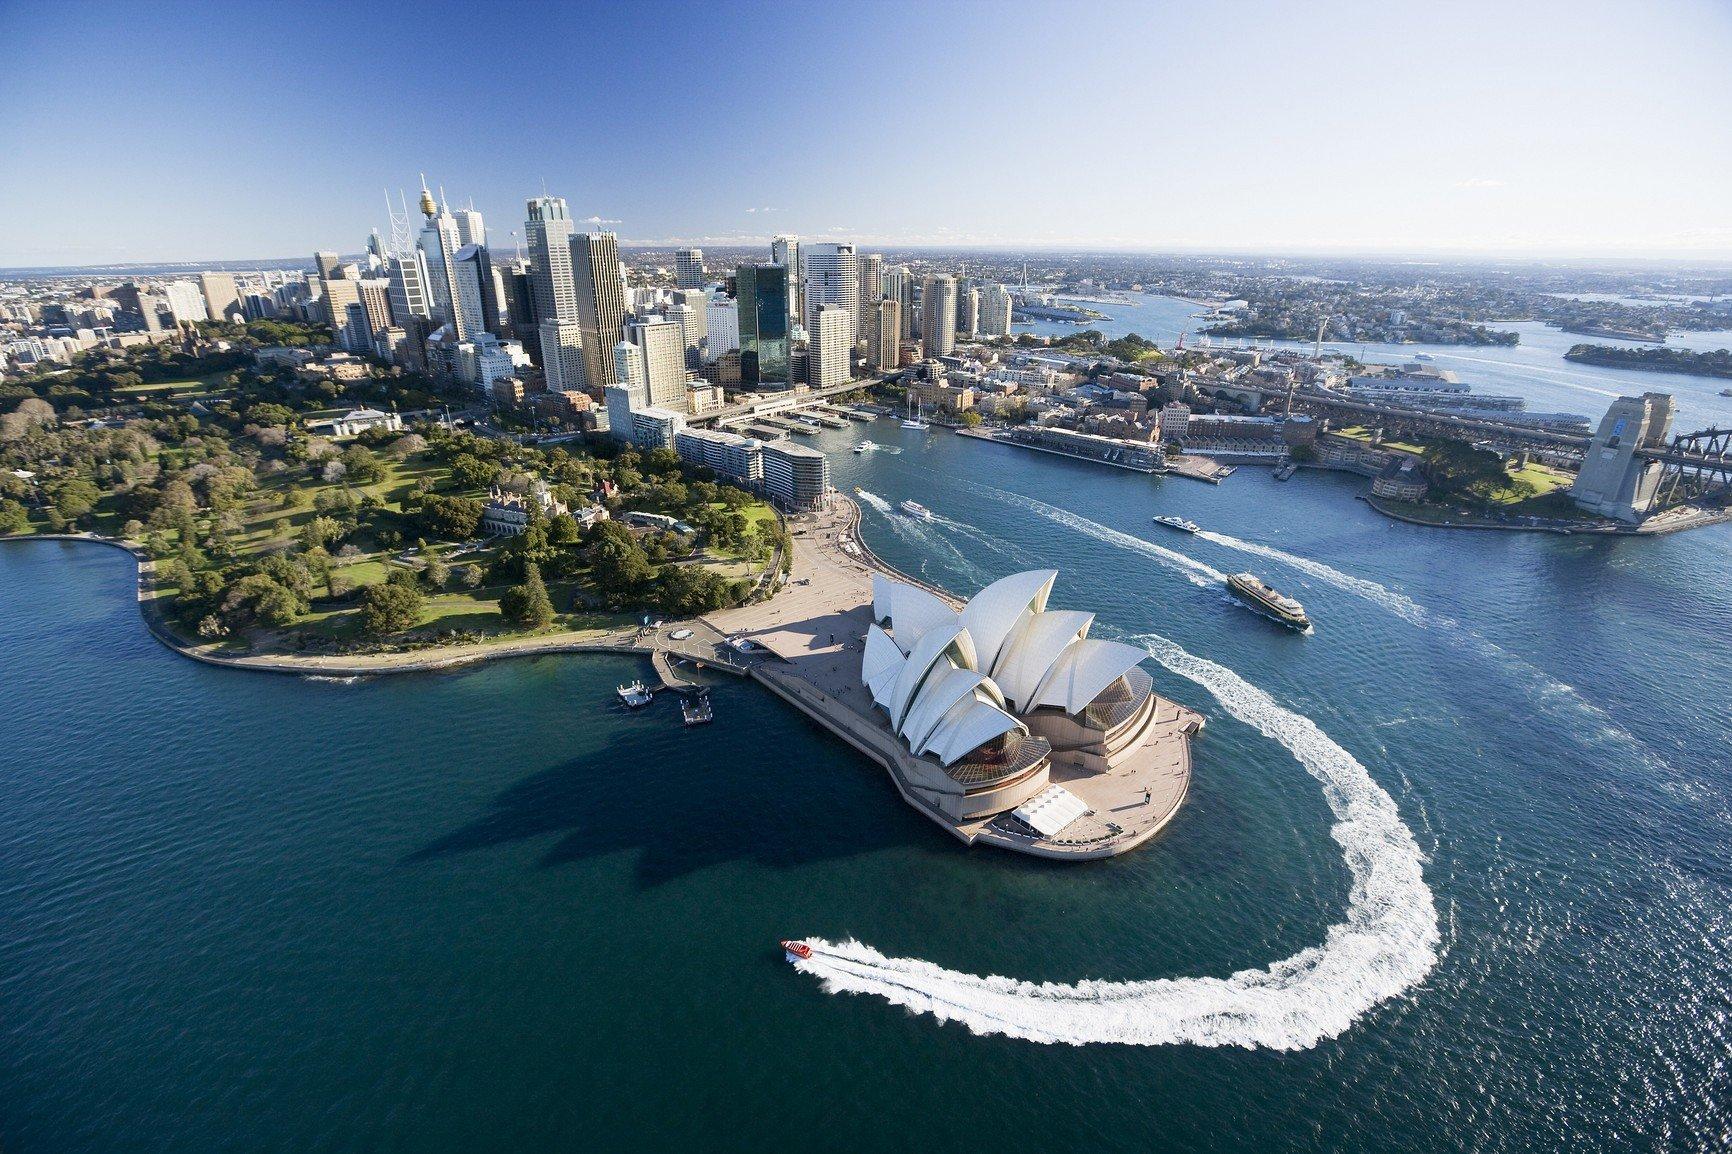 картинки и фотографии австралия тех